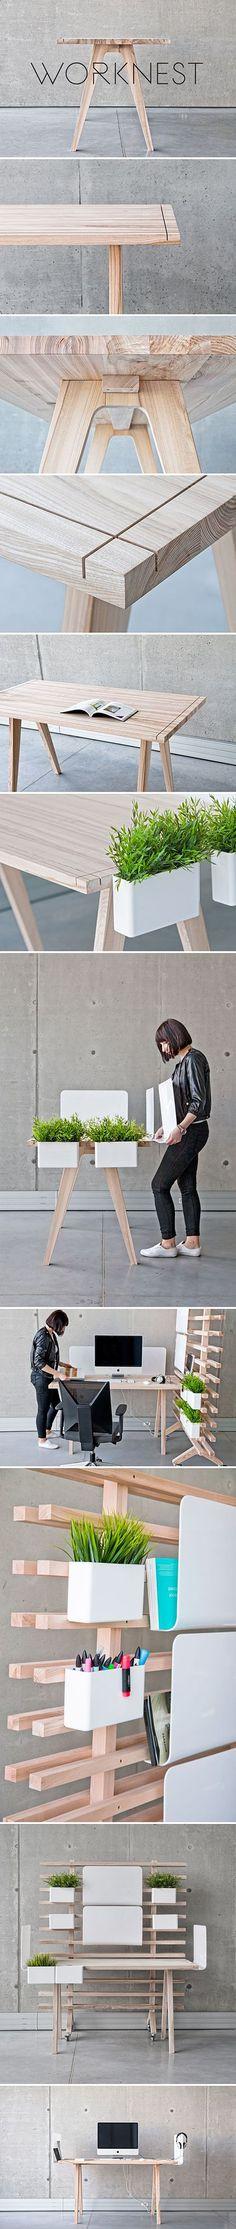 Worknest: handcrafted modular workplace, design from Wiktoria Lenart. | Handgemaakt modulaire werkplek. Wood desk, wood table,